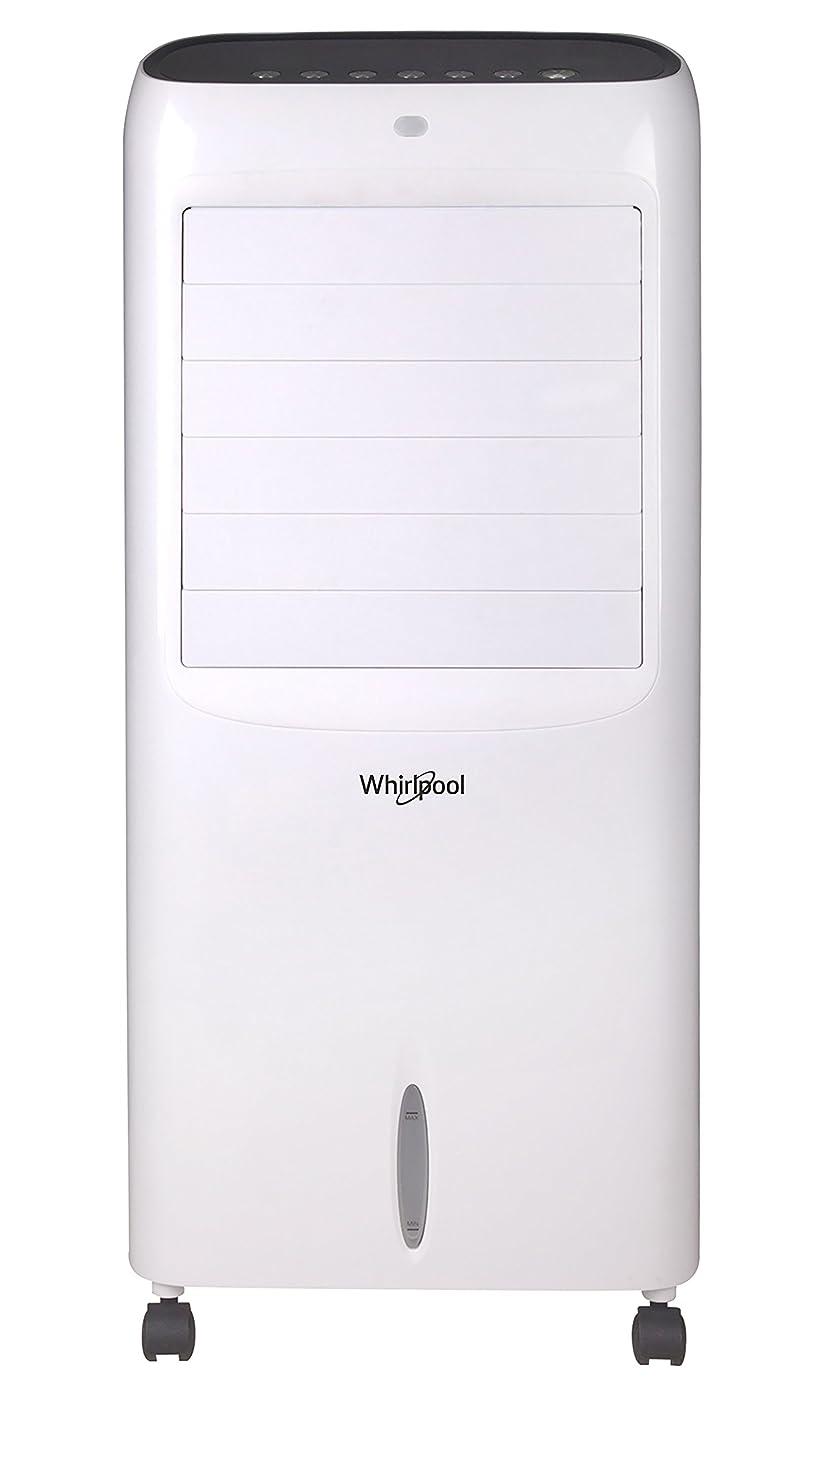 Whirlpool WPEC12GW 214 Cfm Indoor White Evaporative Air Cooler rsqredlhwbqzy6